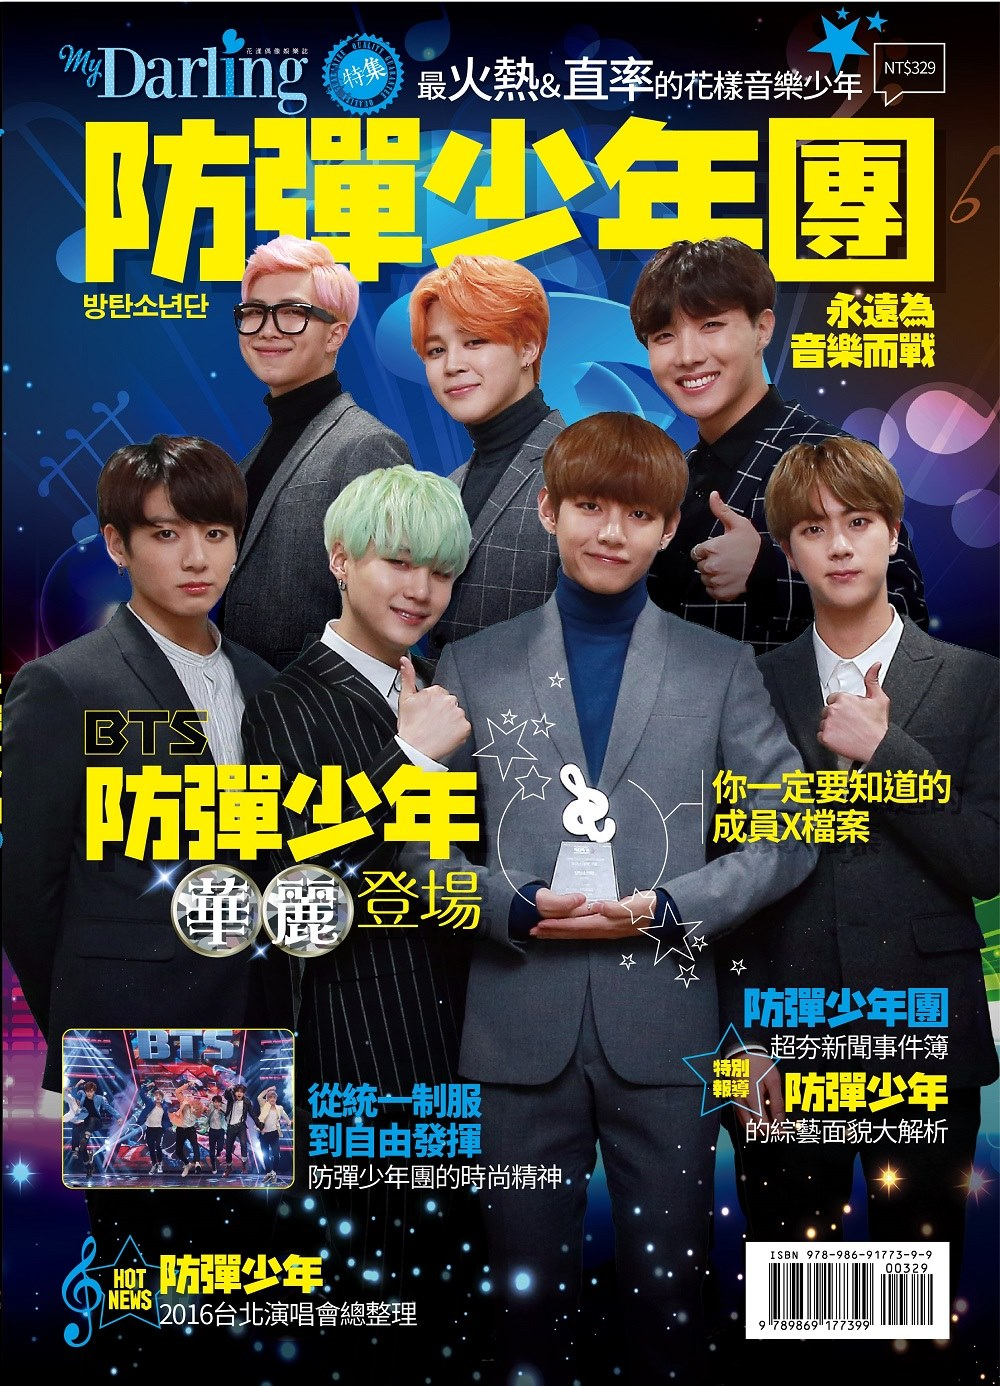 BTS防彈少年團:永遠為音樂而戰,最火熱 直率的花樣音樂少年^!